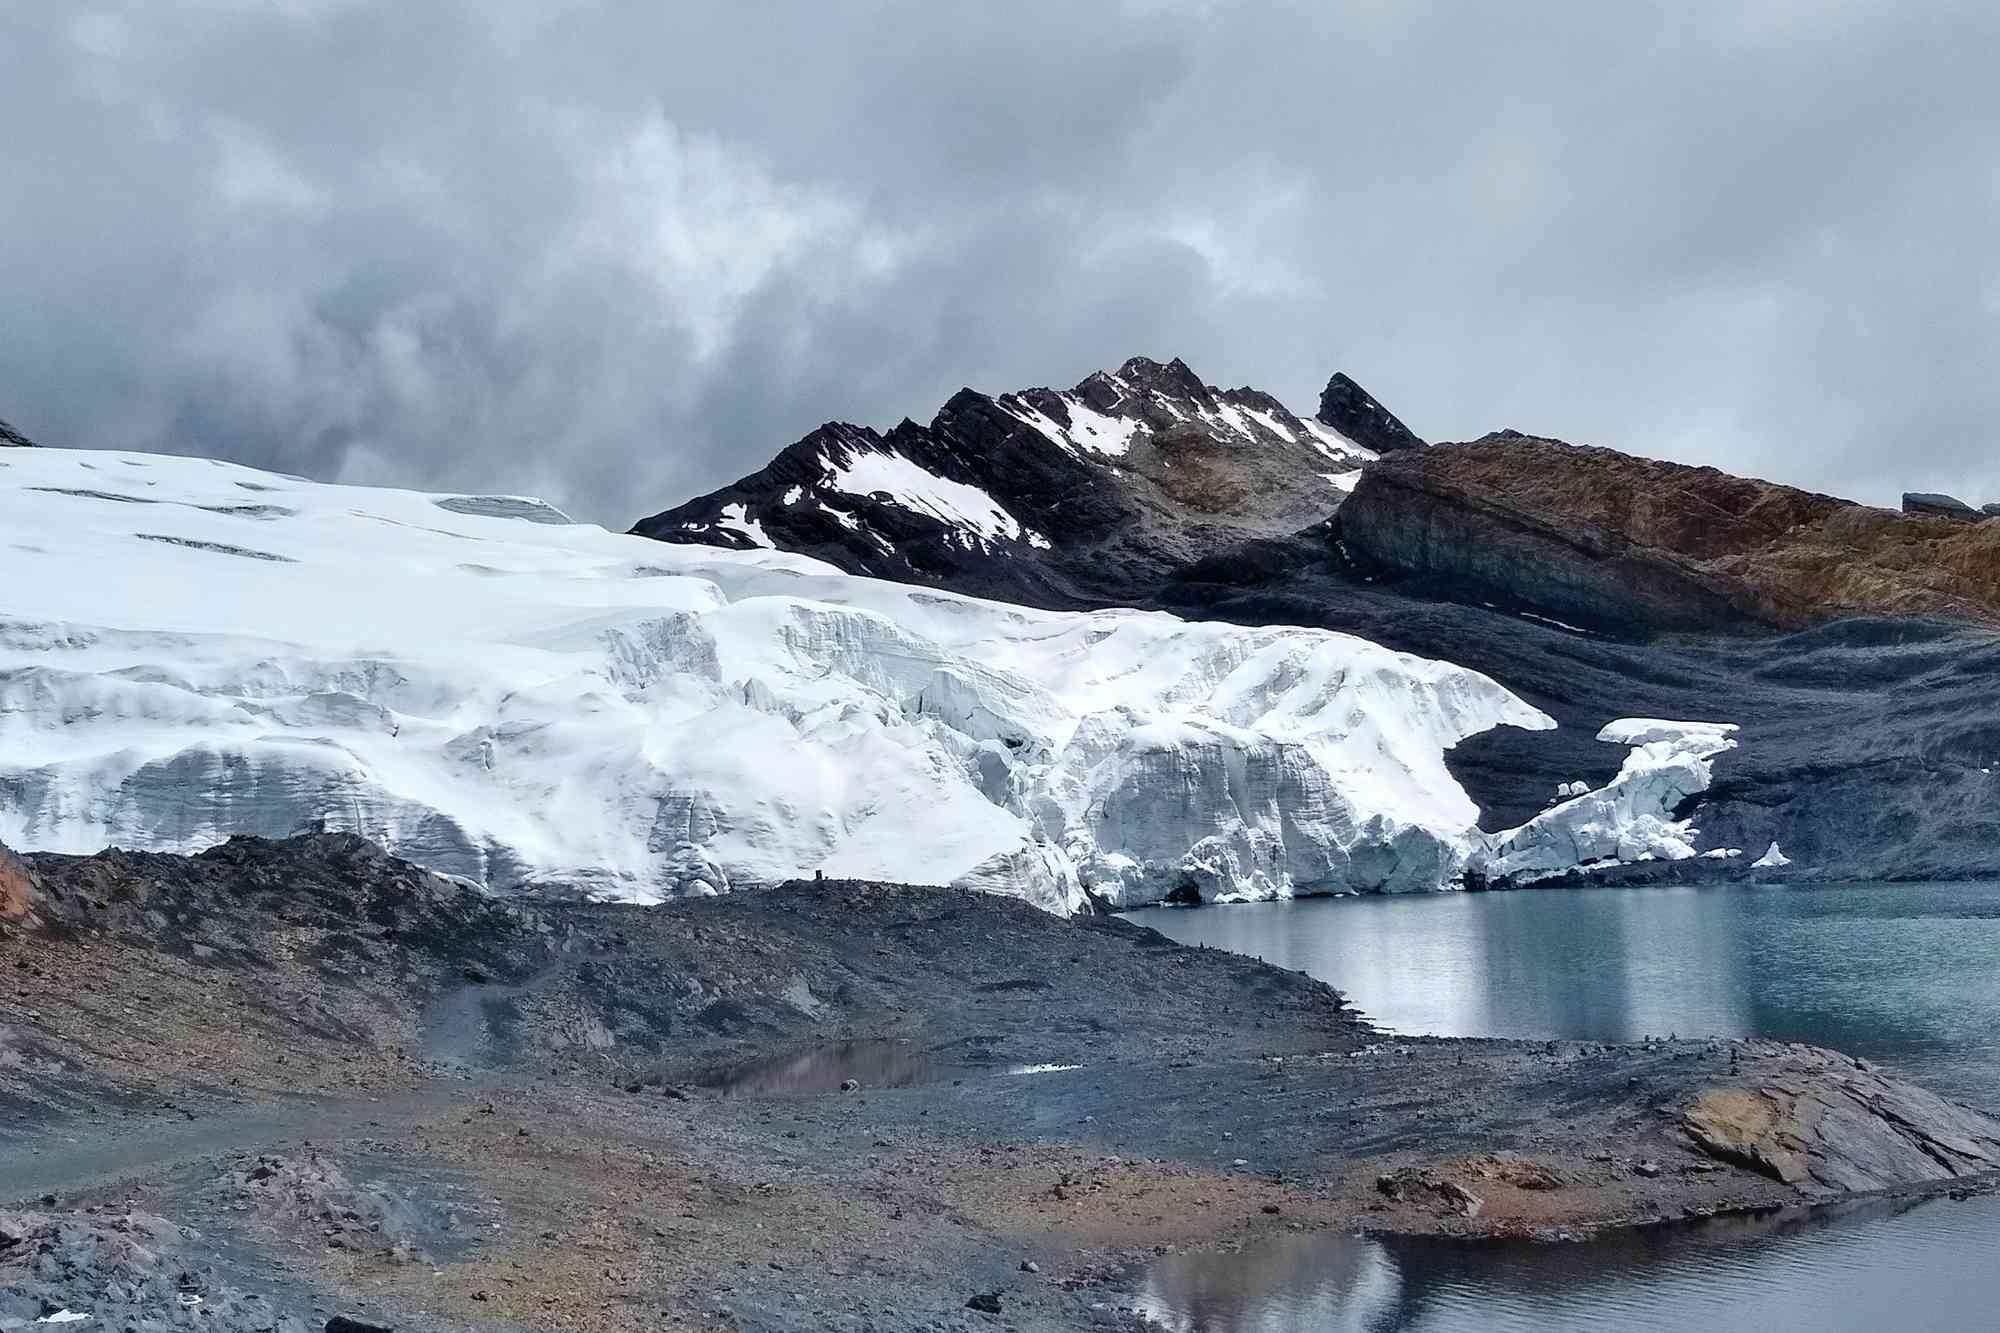 Peru's famous Pastoruri Glacier bordering a bay